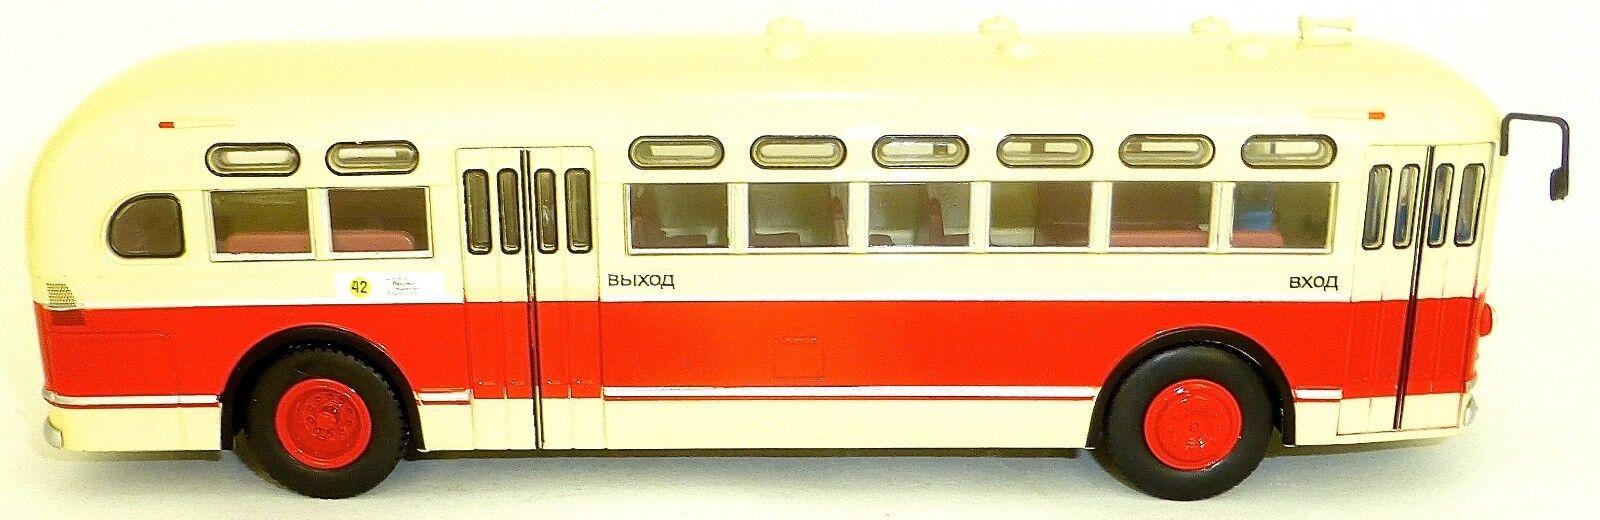 Zis 154 Russia 1946-49 Bus Ixo 1 43 Nip  ACBUS037  HH3 Μ